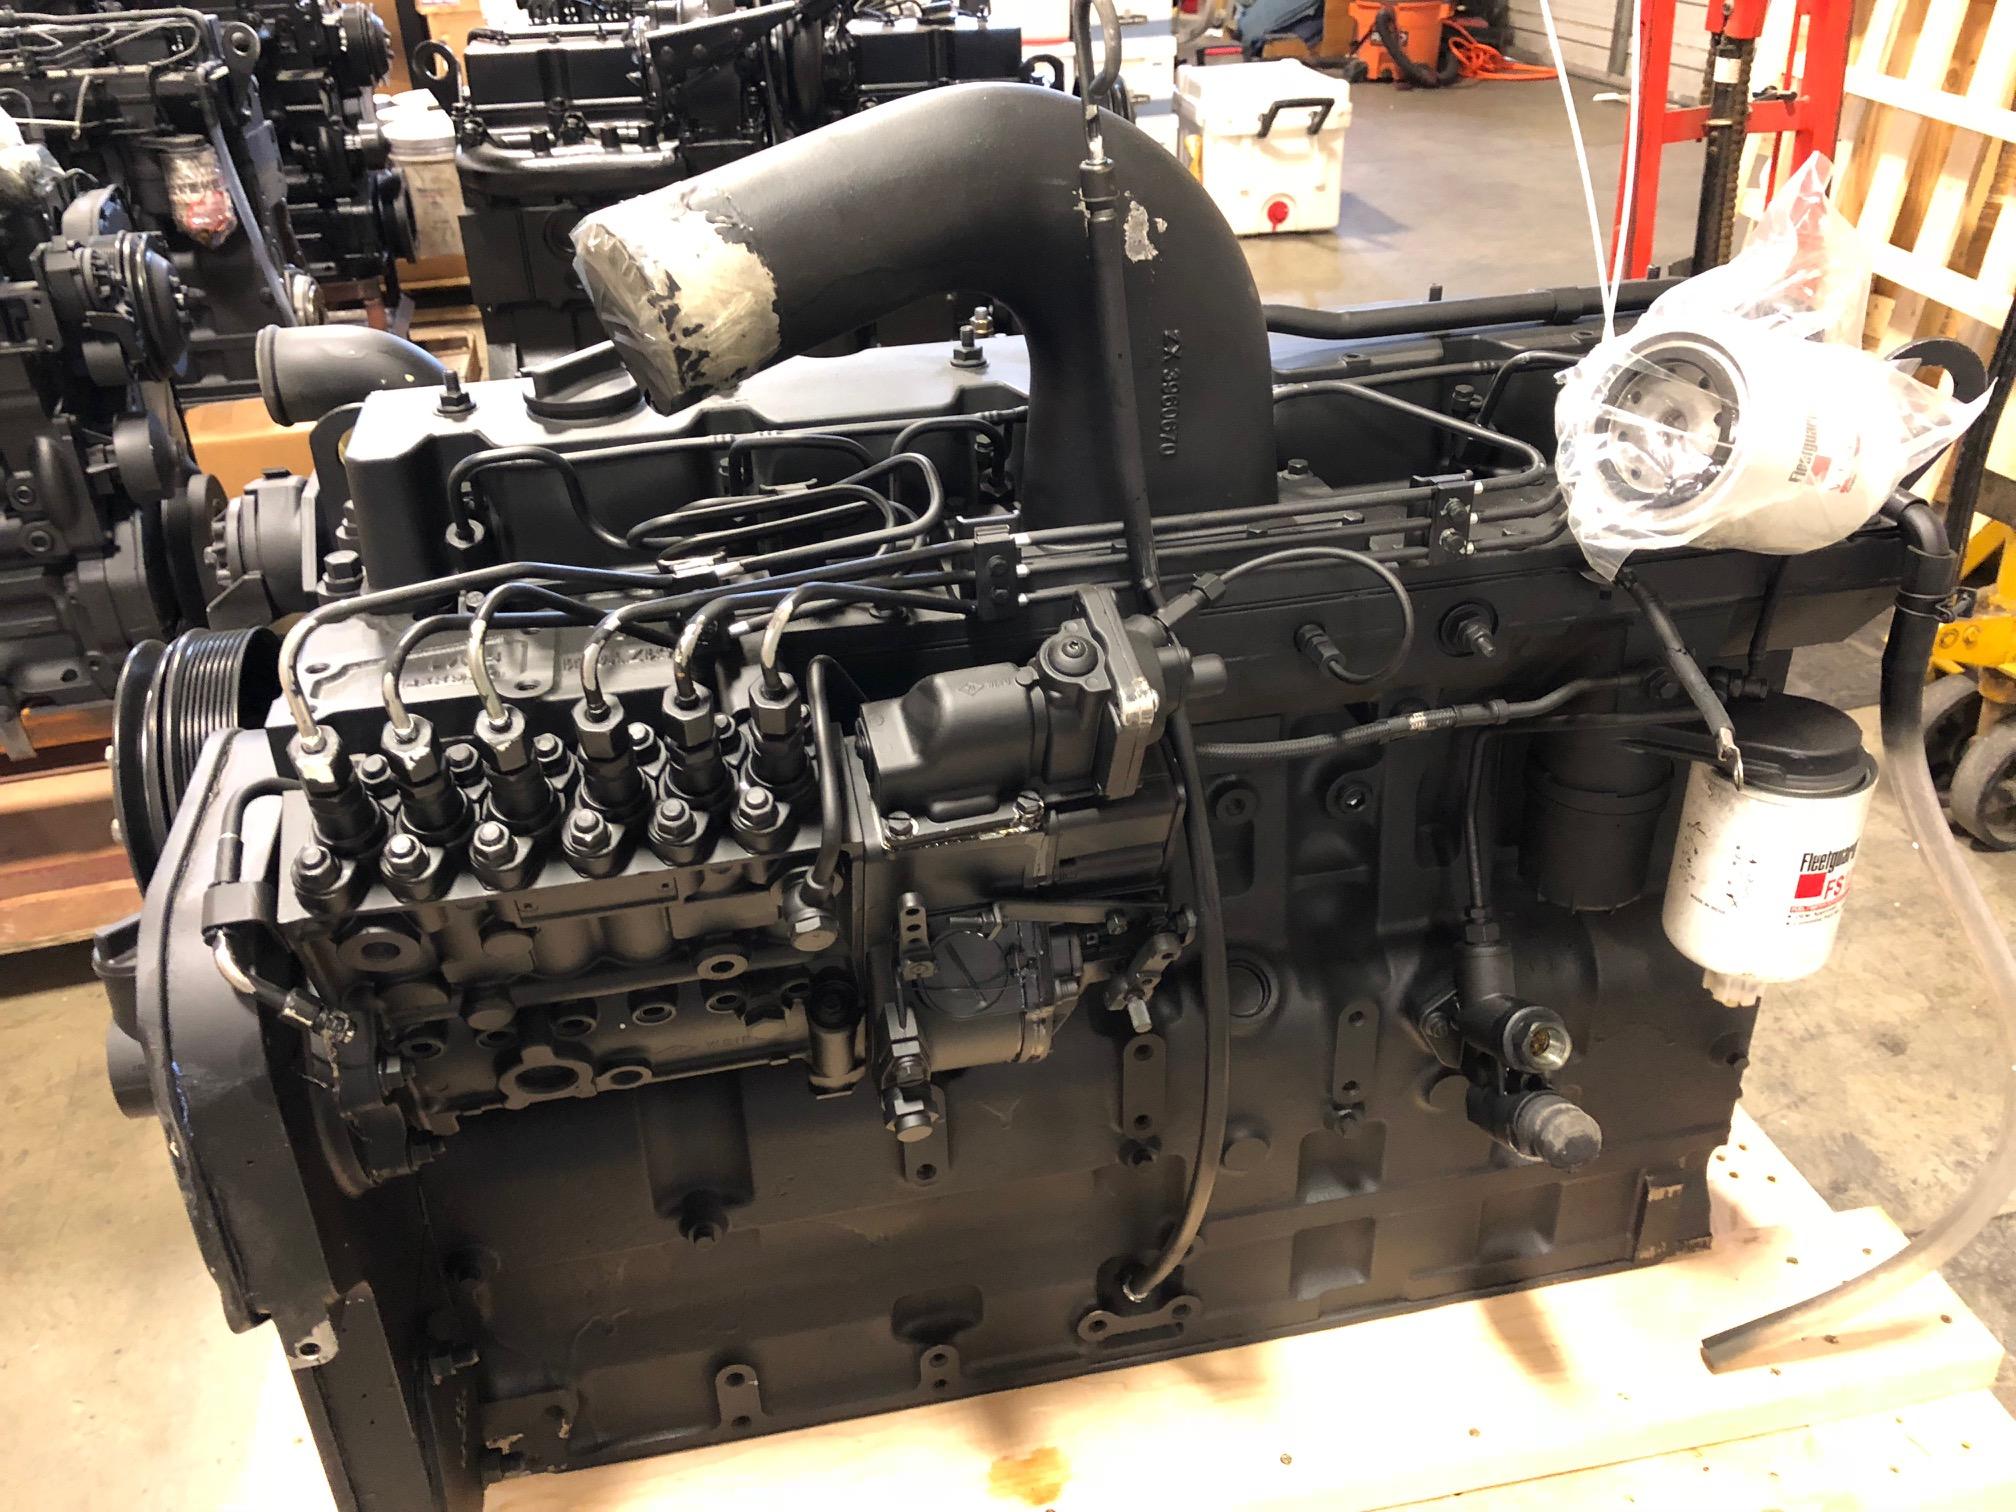 cummins engine 6ct diesel thermostat 300hp complete 300 hp engines bear